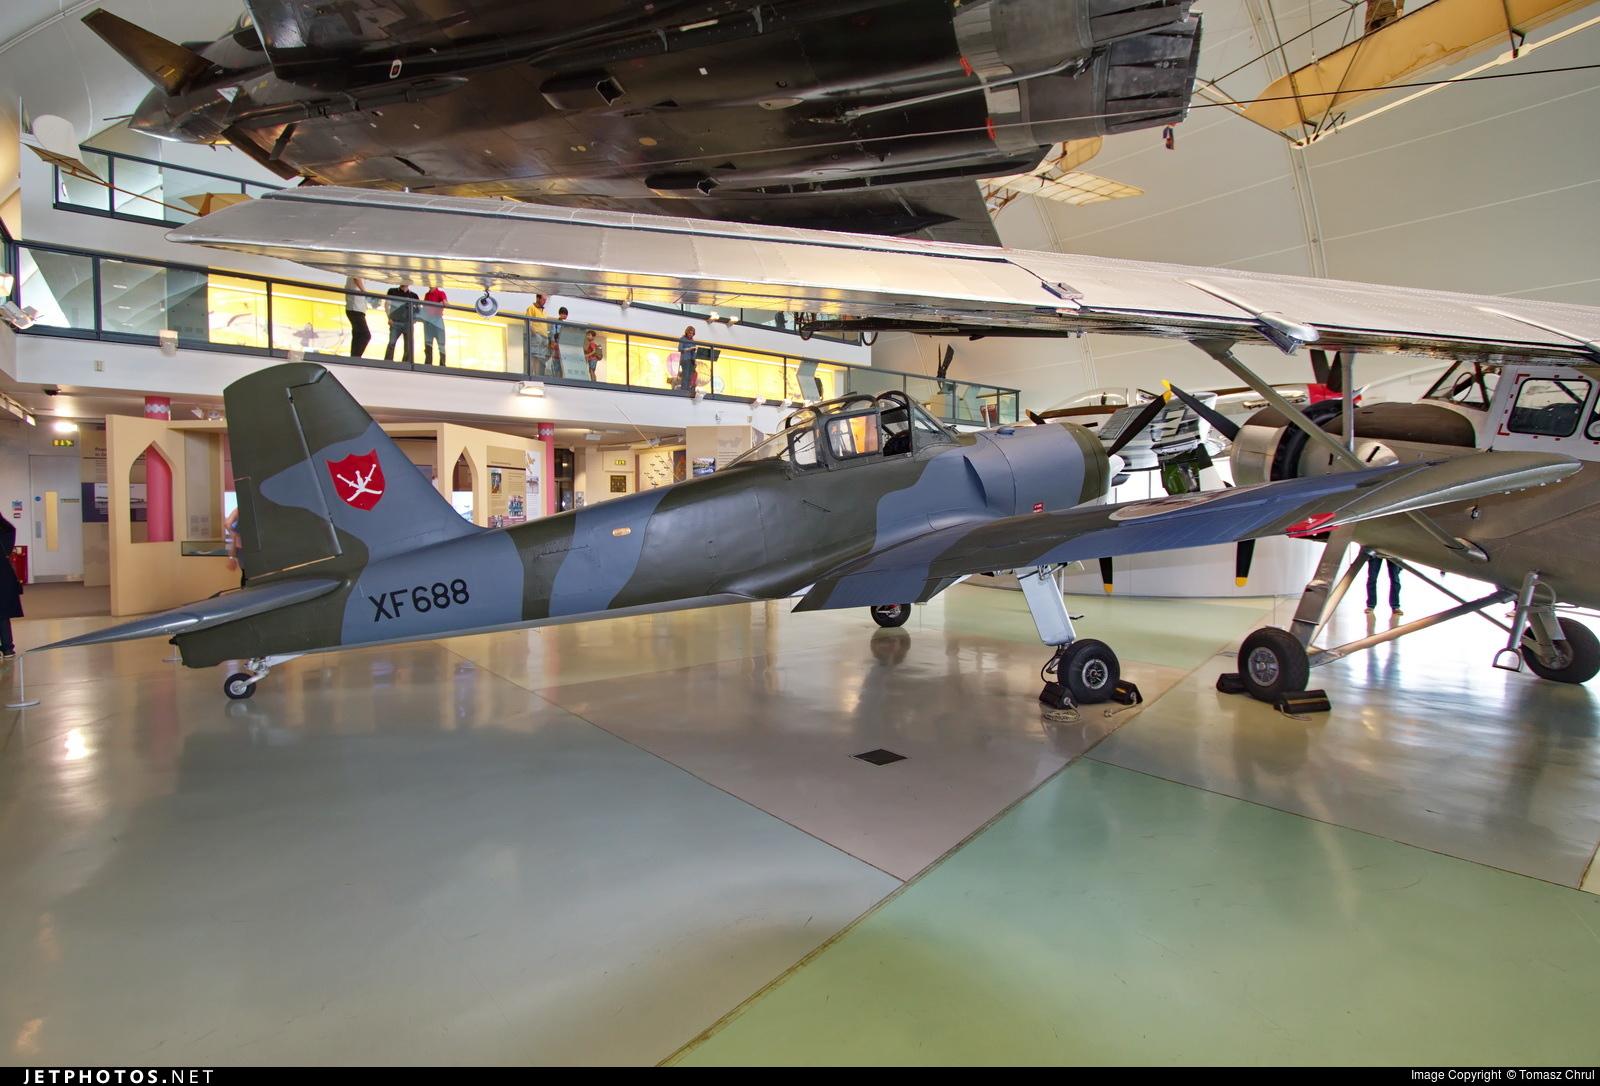 WV562 - Percival Provost T.1 - Oman - Royal Air Force